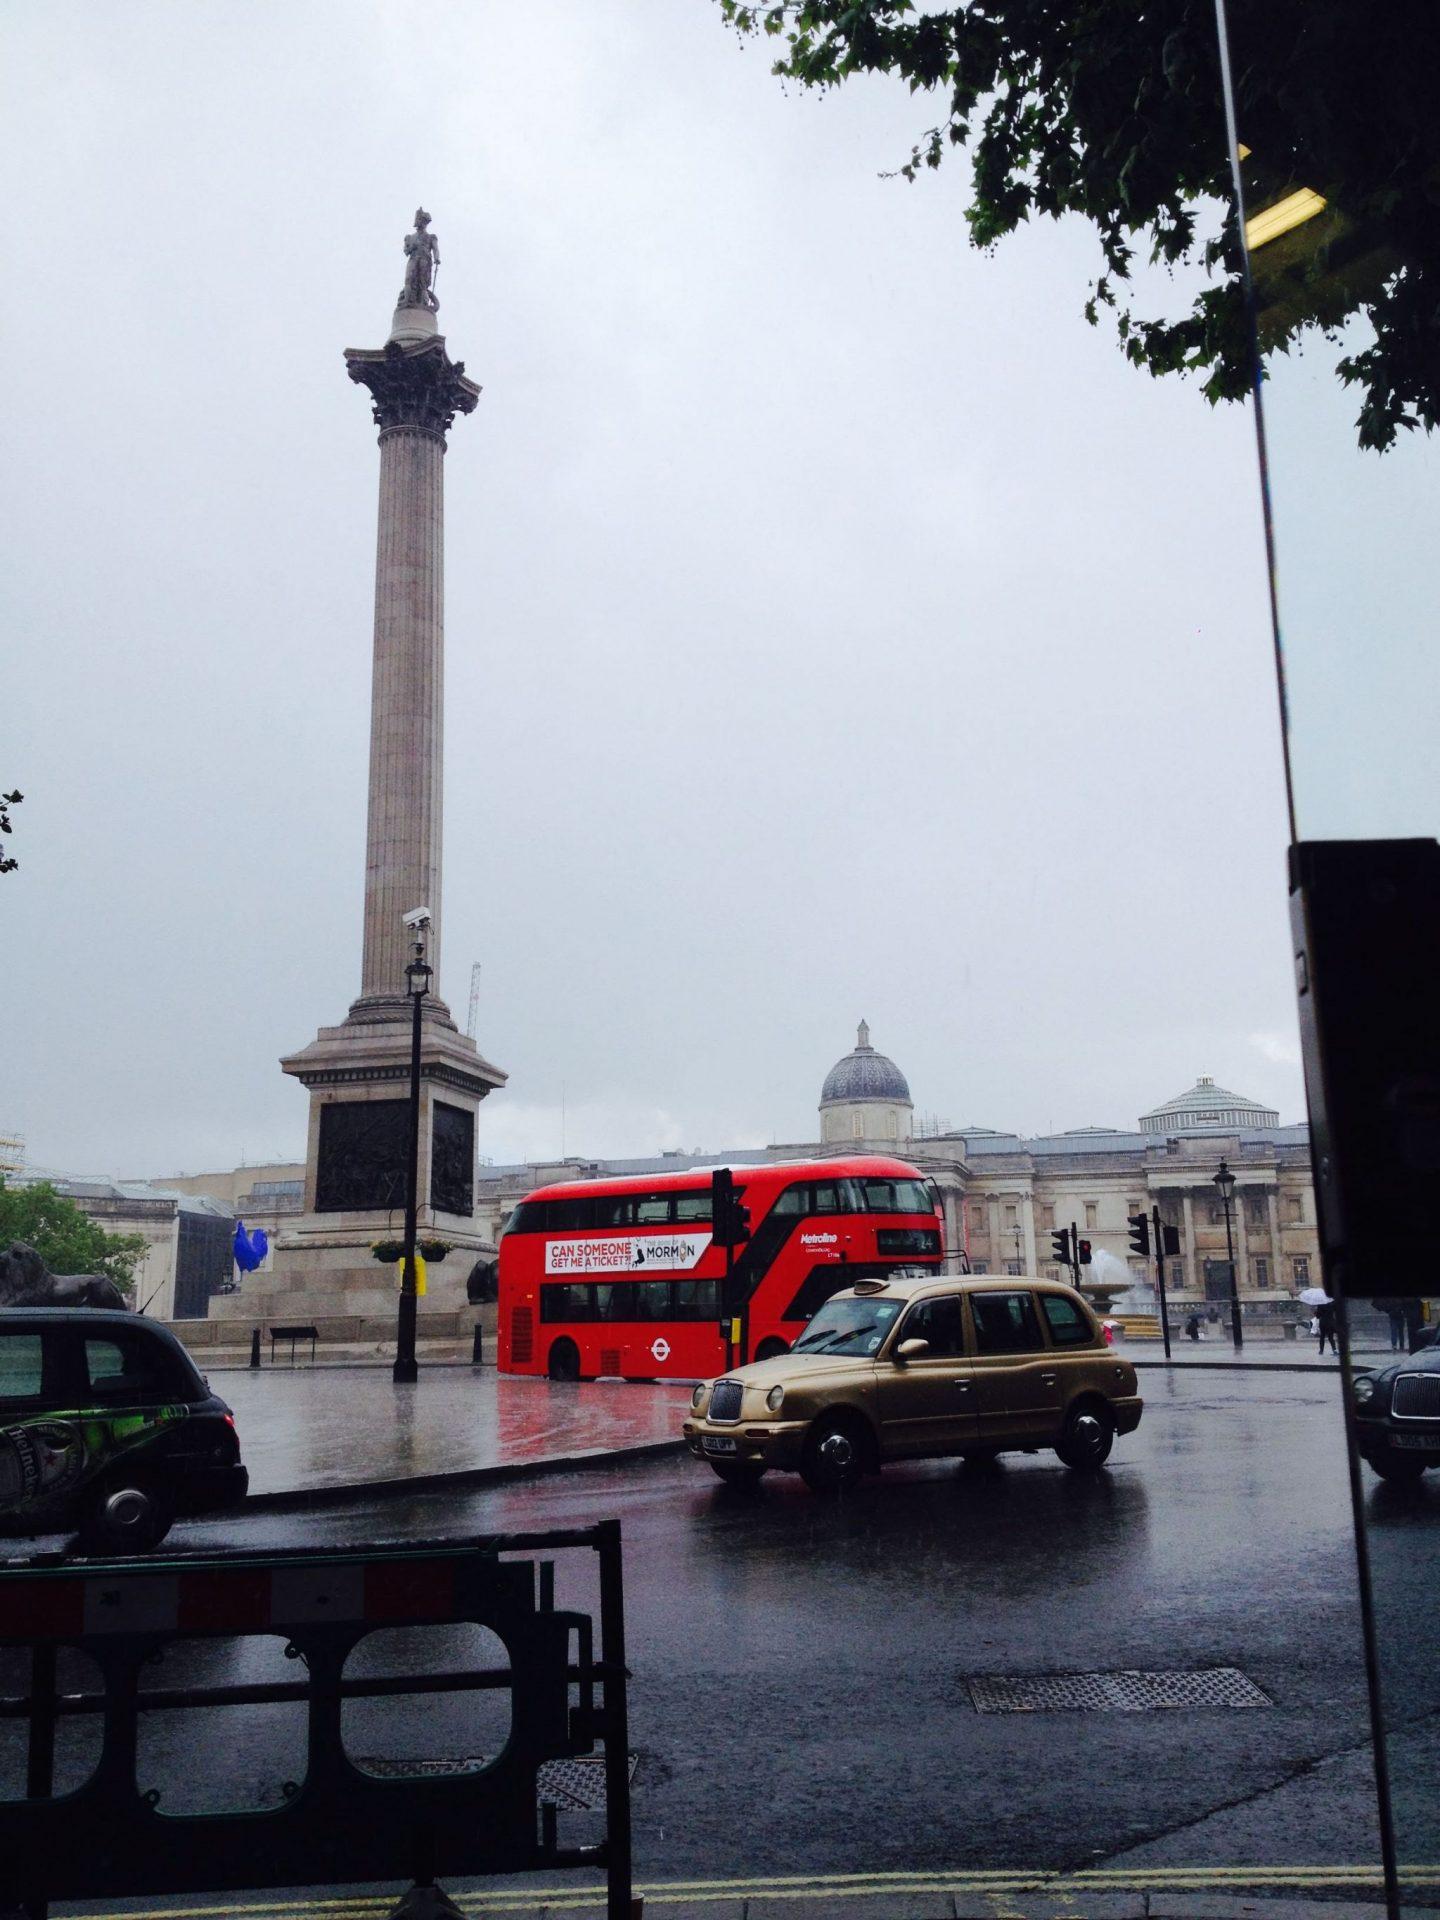 A drizzly Trafalgar Square, London